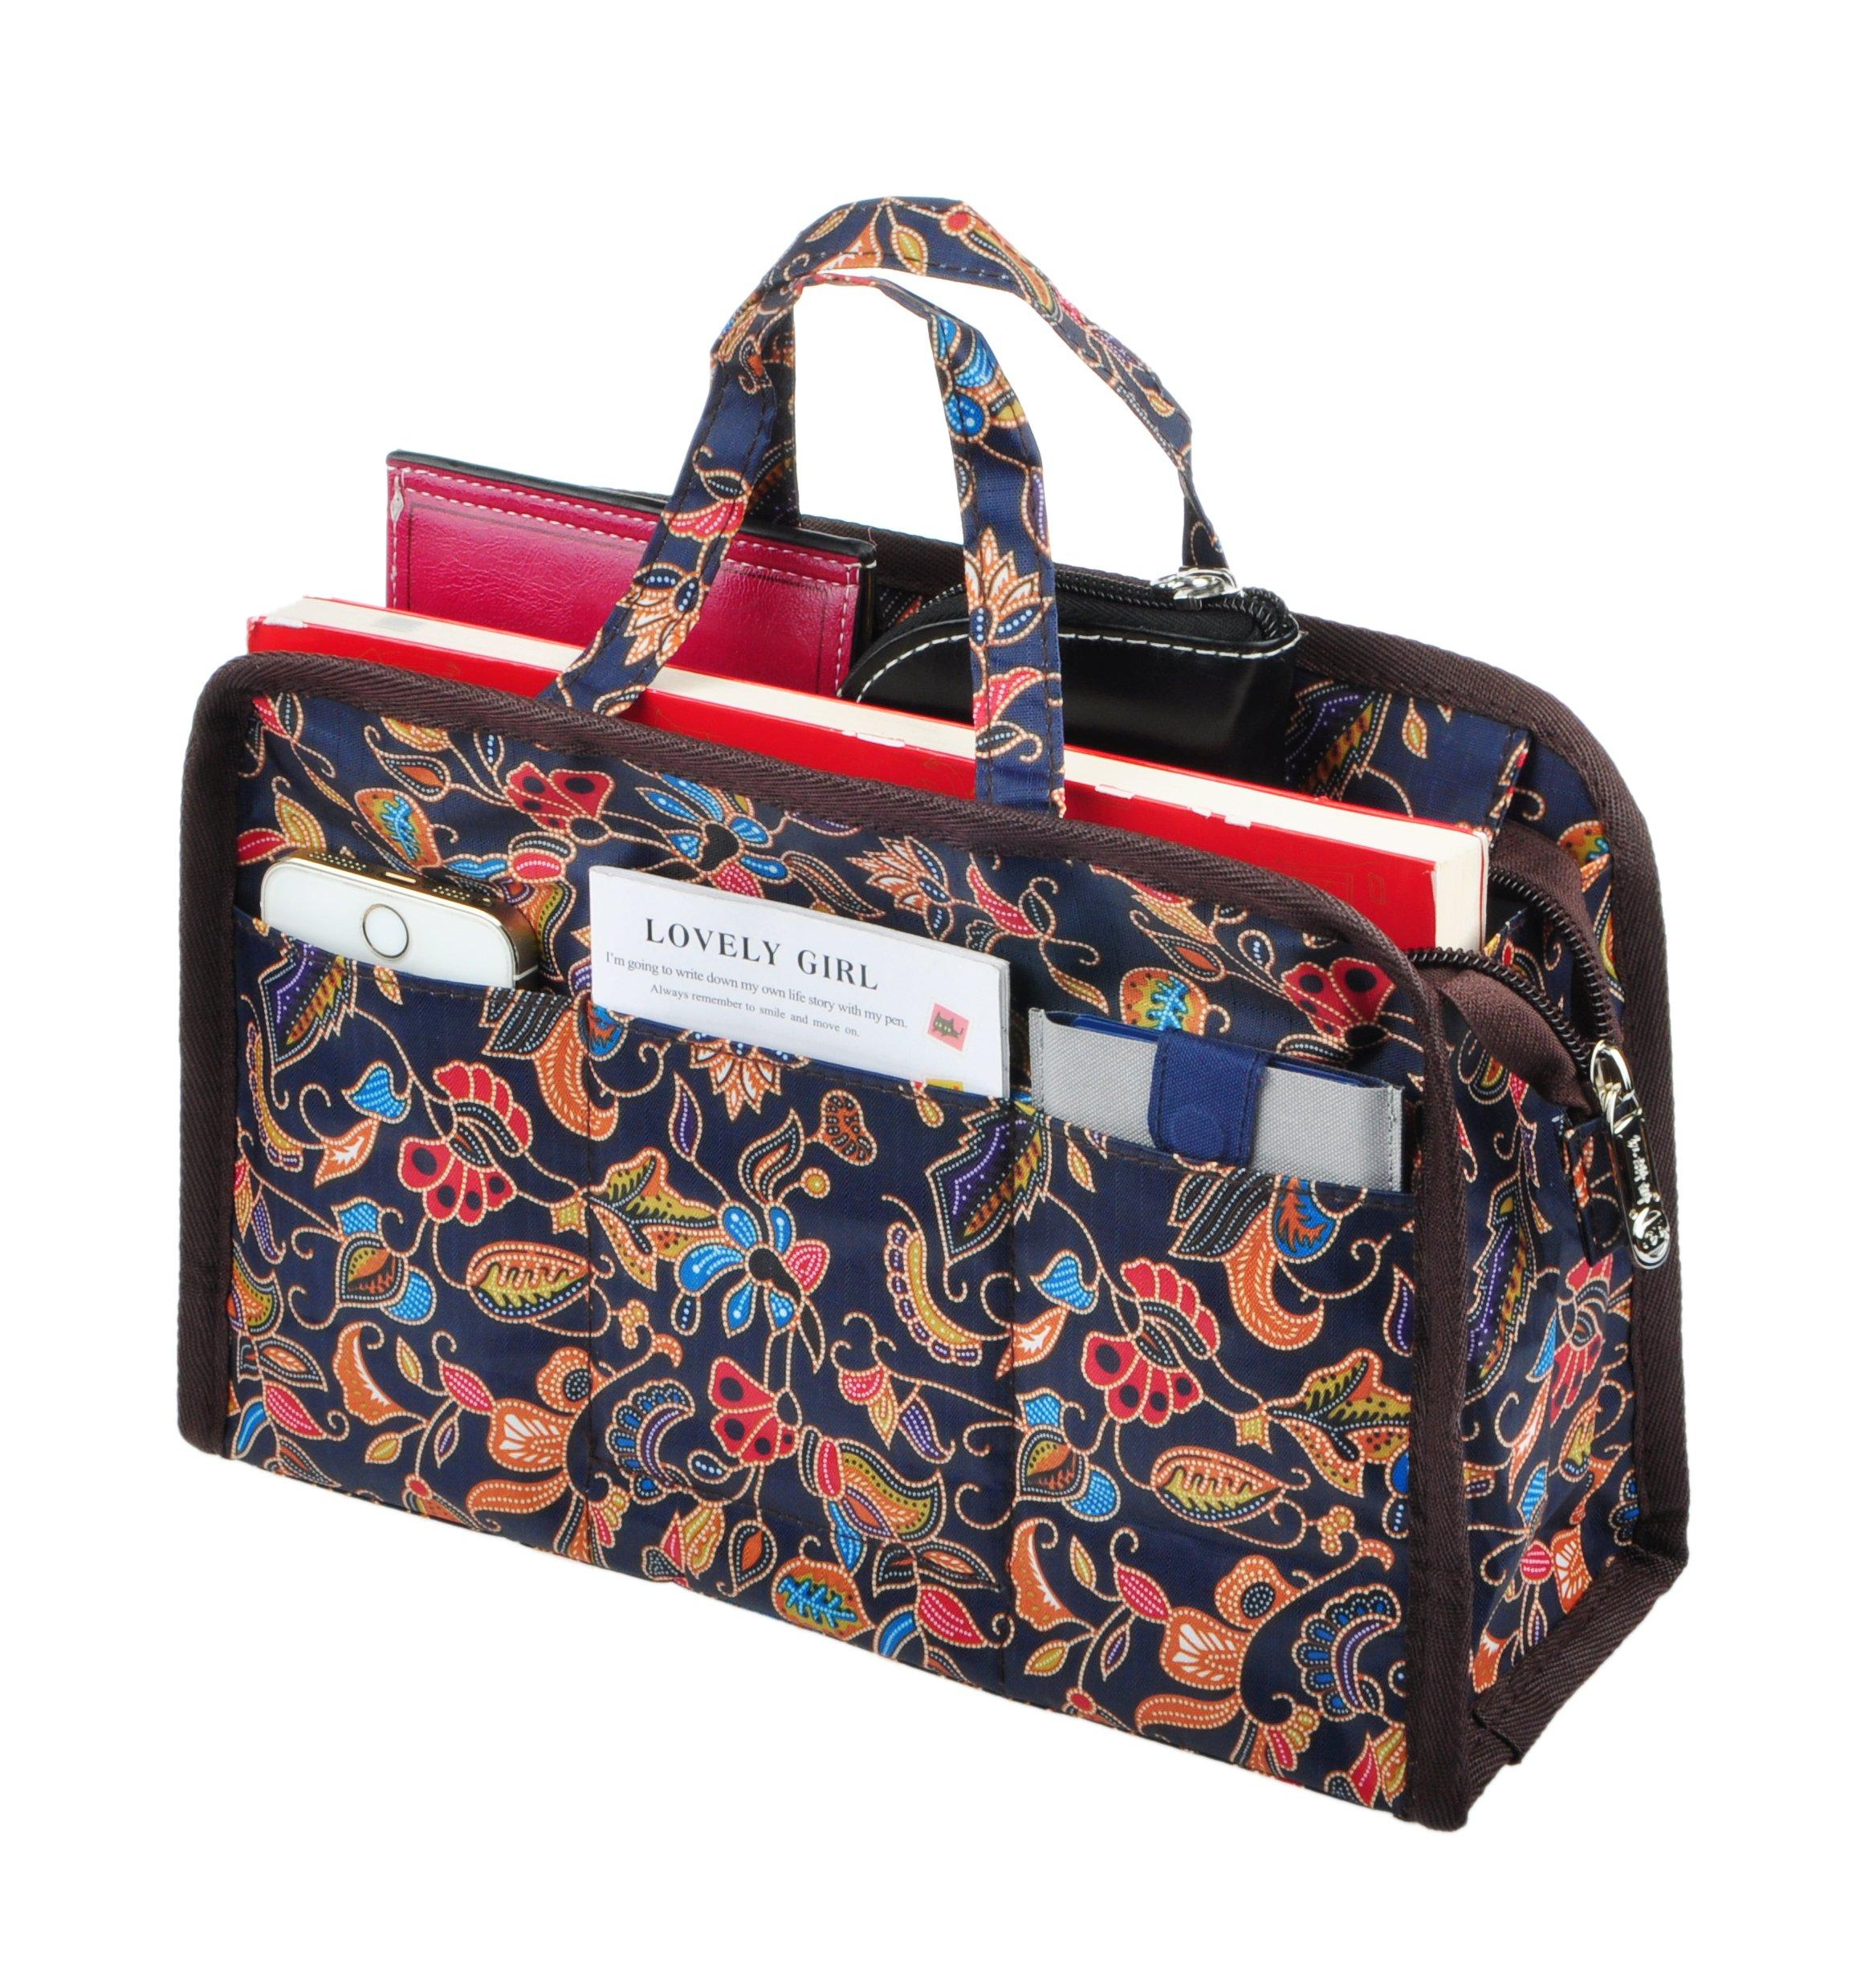 Vercord Sturdy Multi-Pocket Insert Handbag Bag Organizer Water-resistant Large Zipper Bag In Bag, Printed Handle